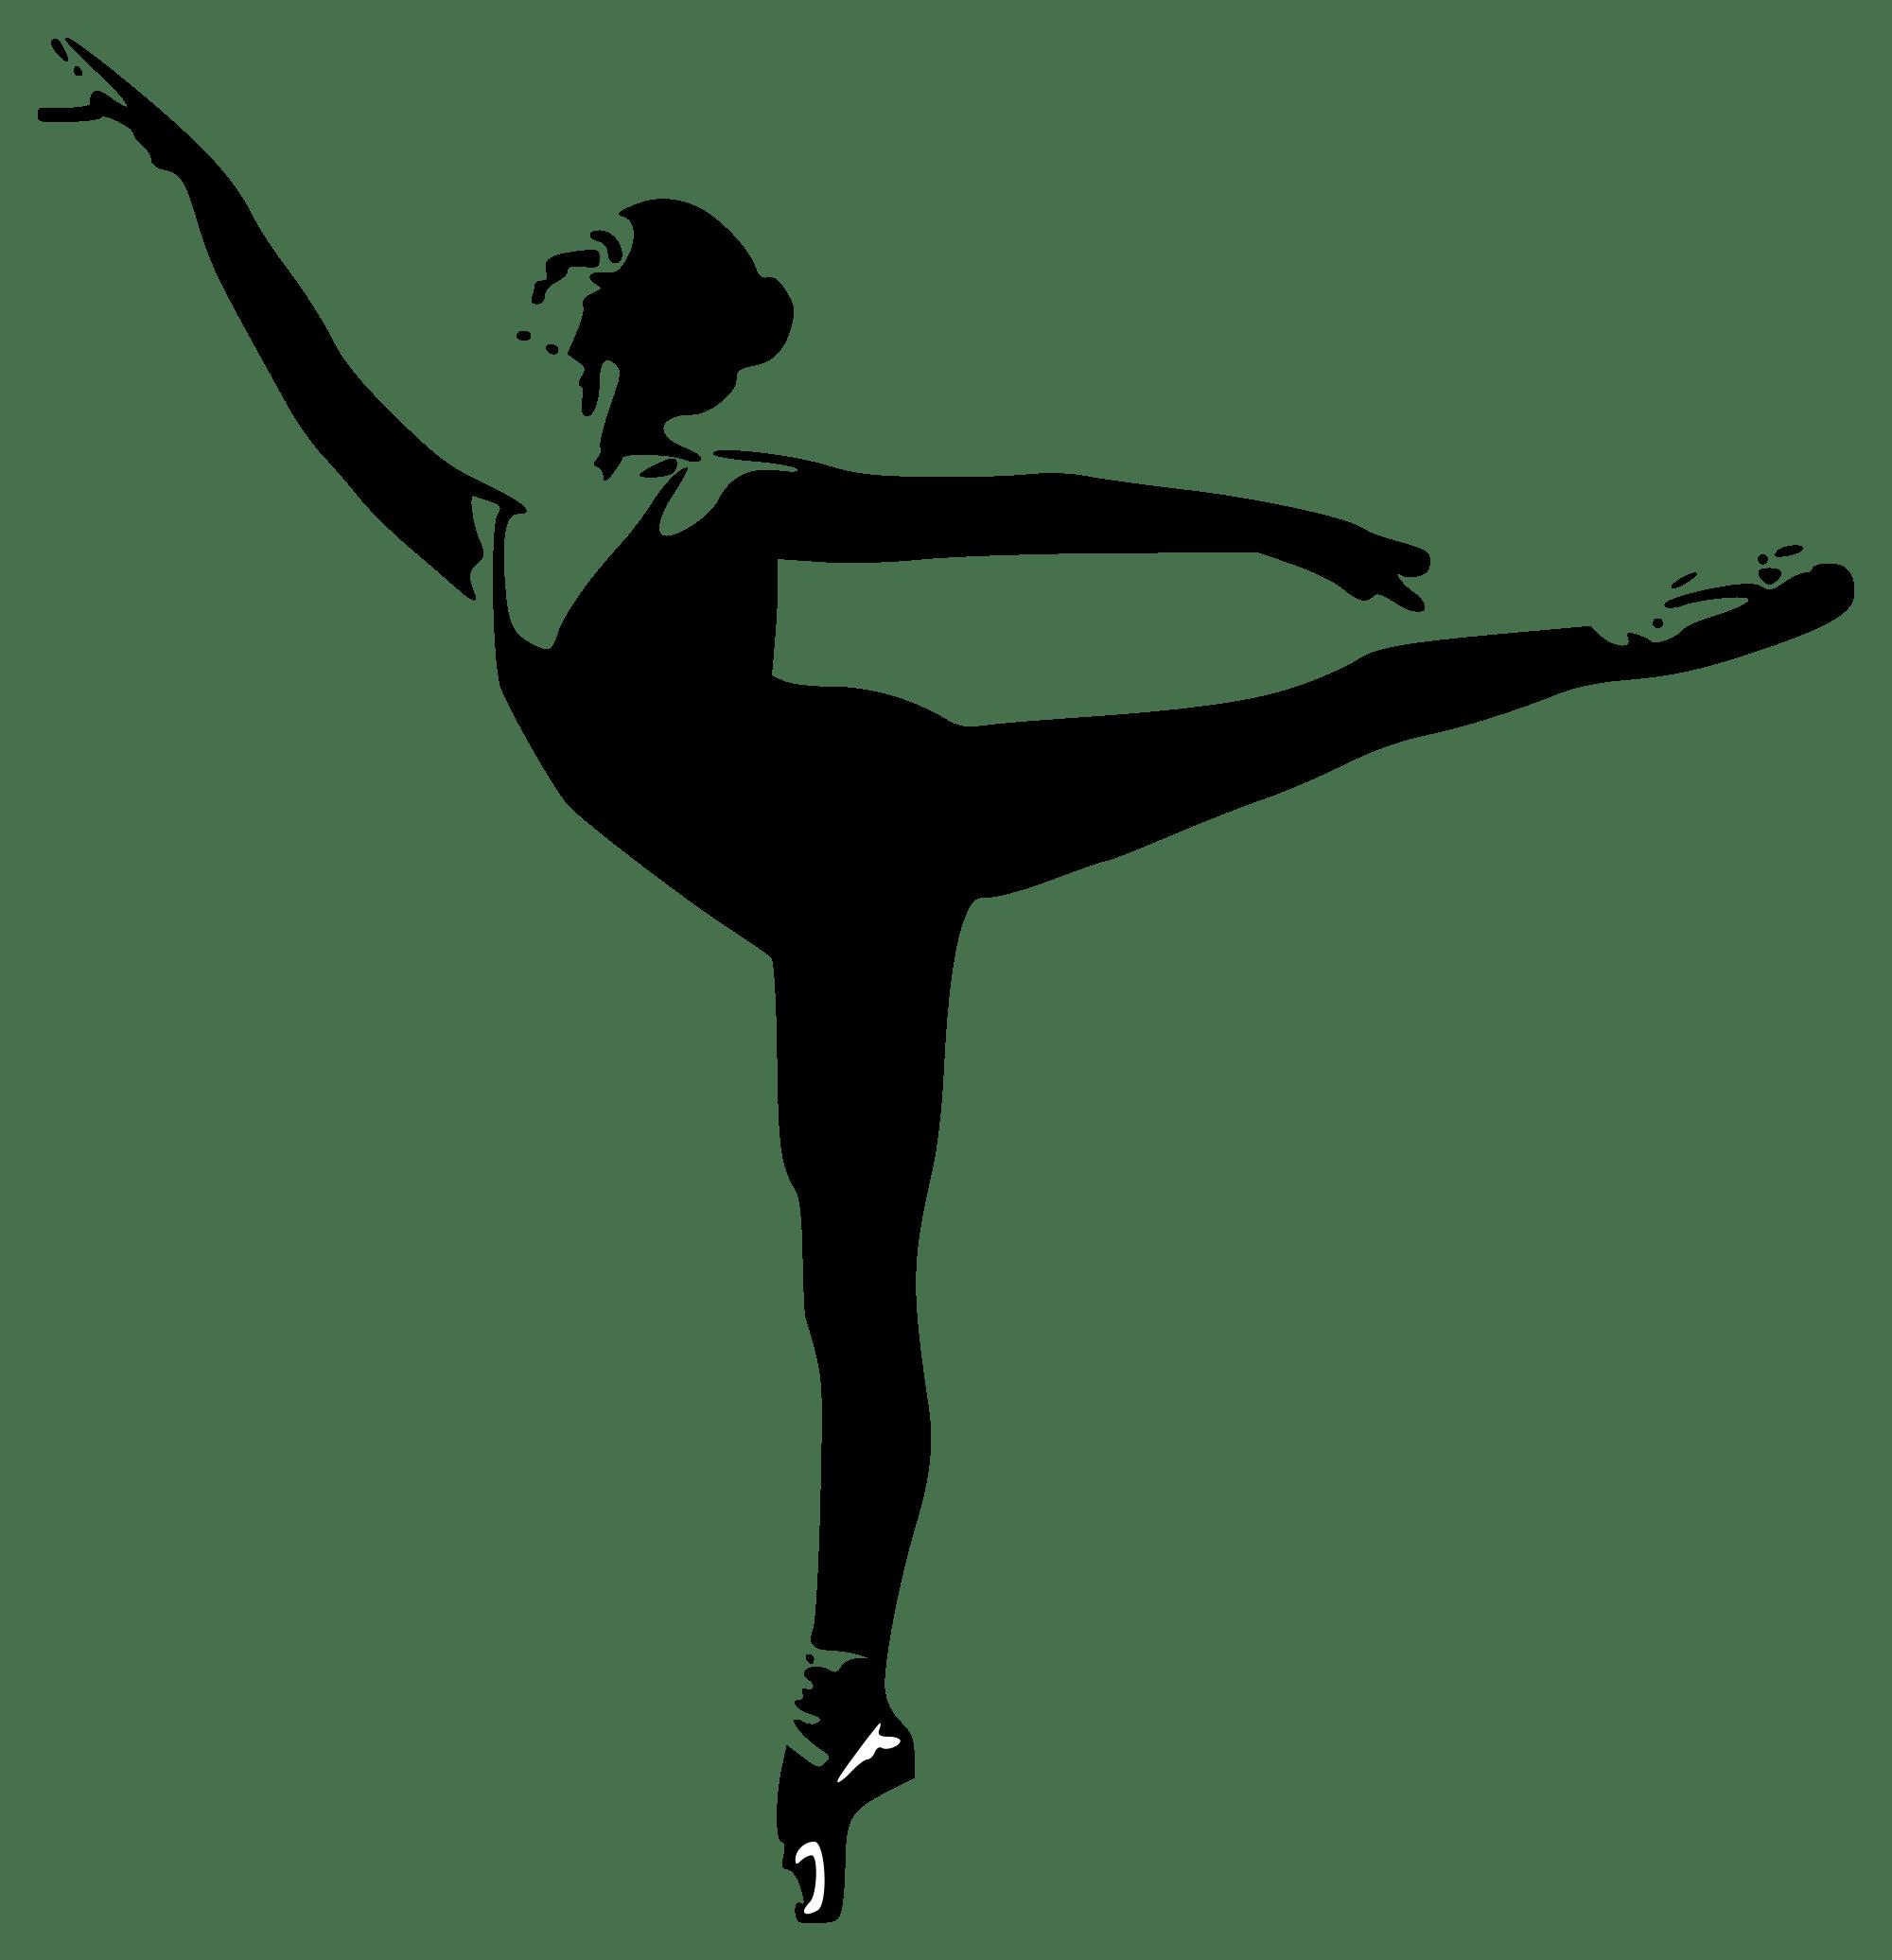 Baby Ballerina Silhouette